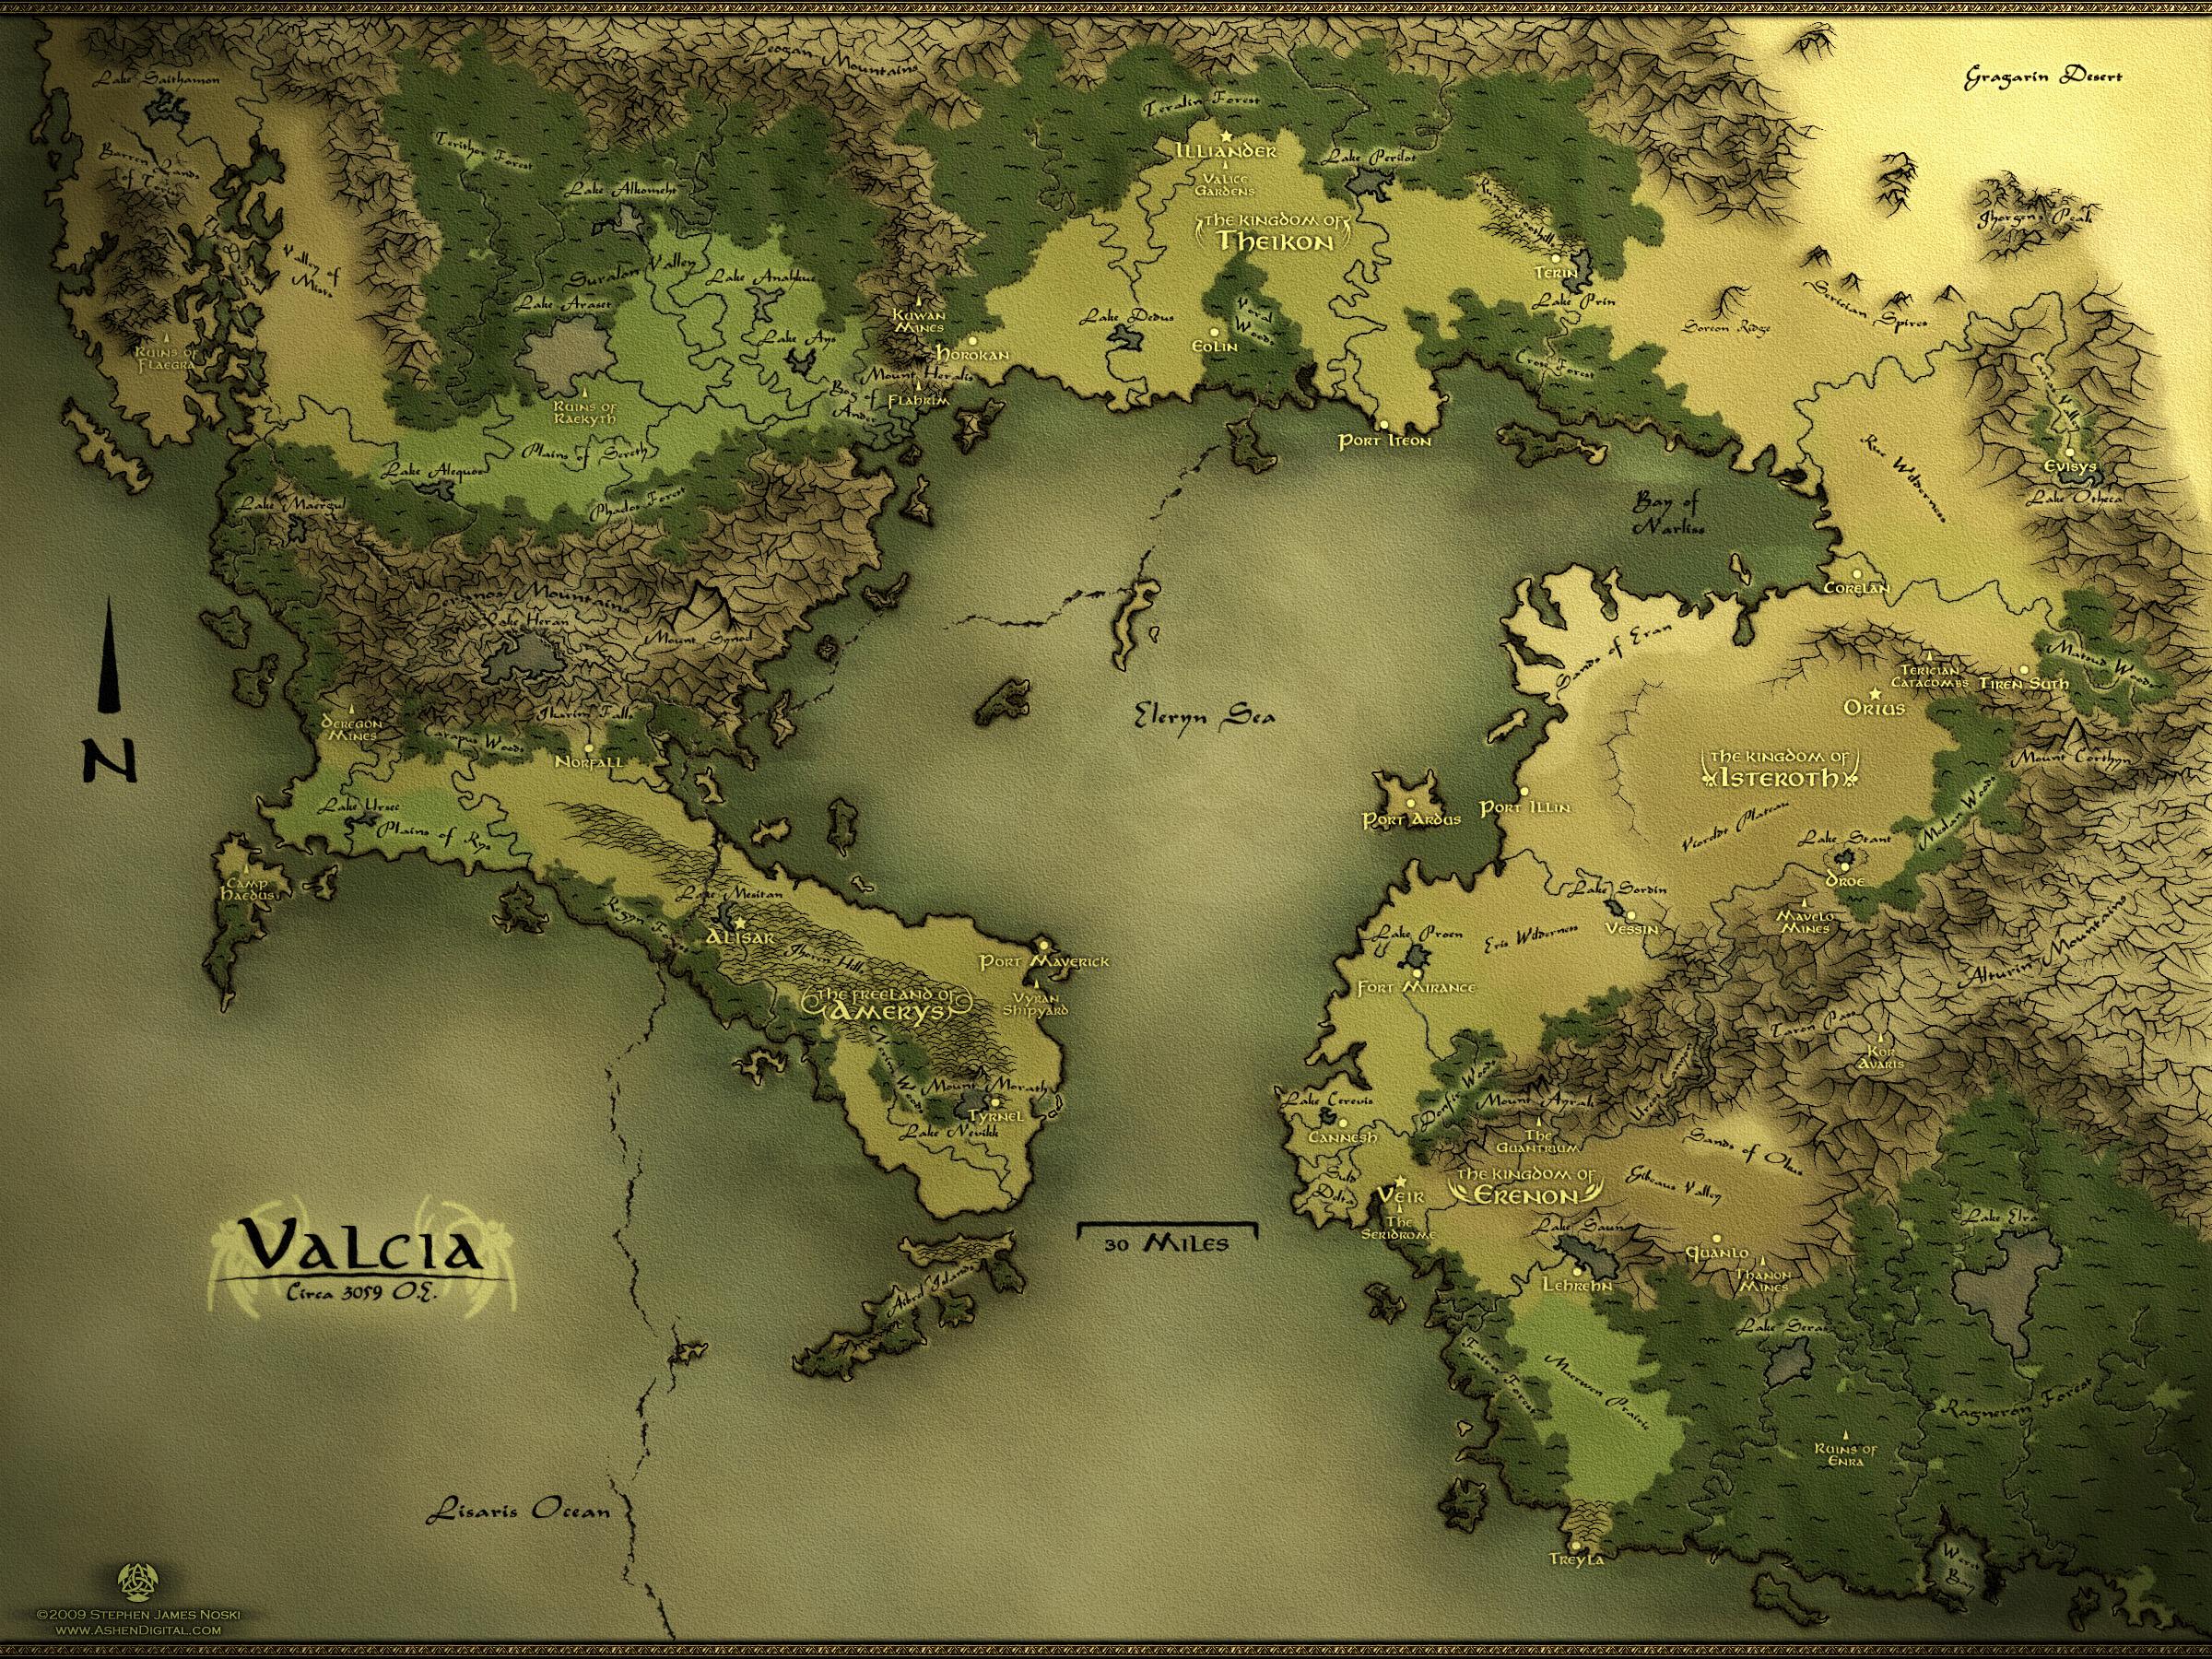 Valcia - Regional Fantasy Map by Authsauce